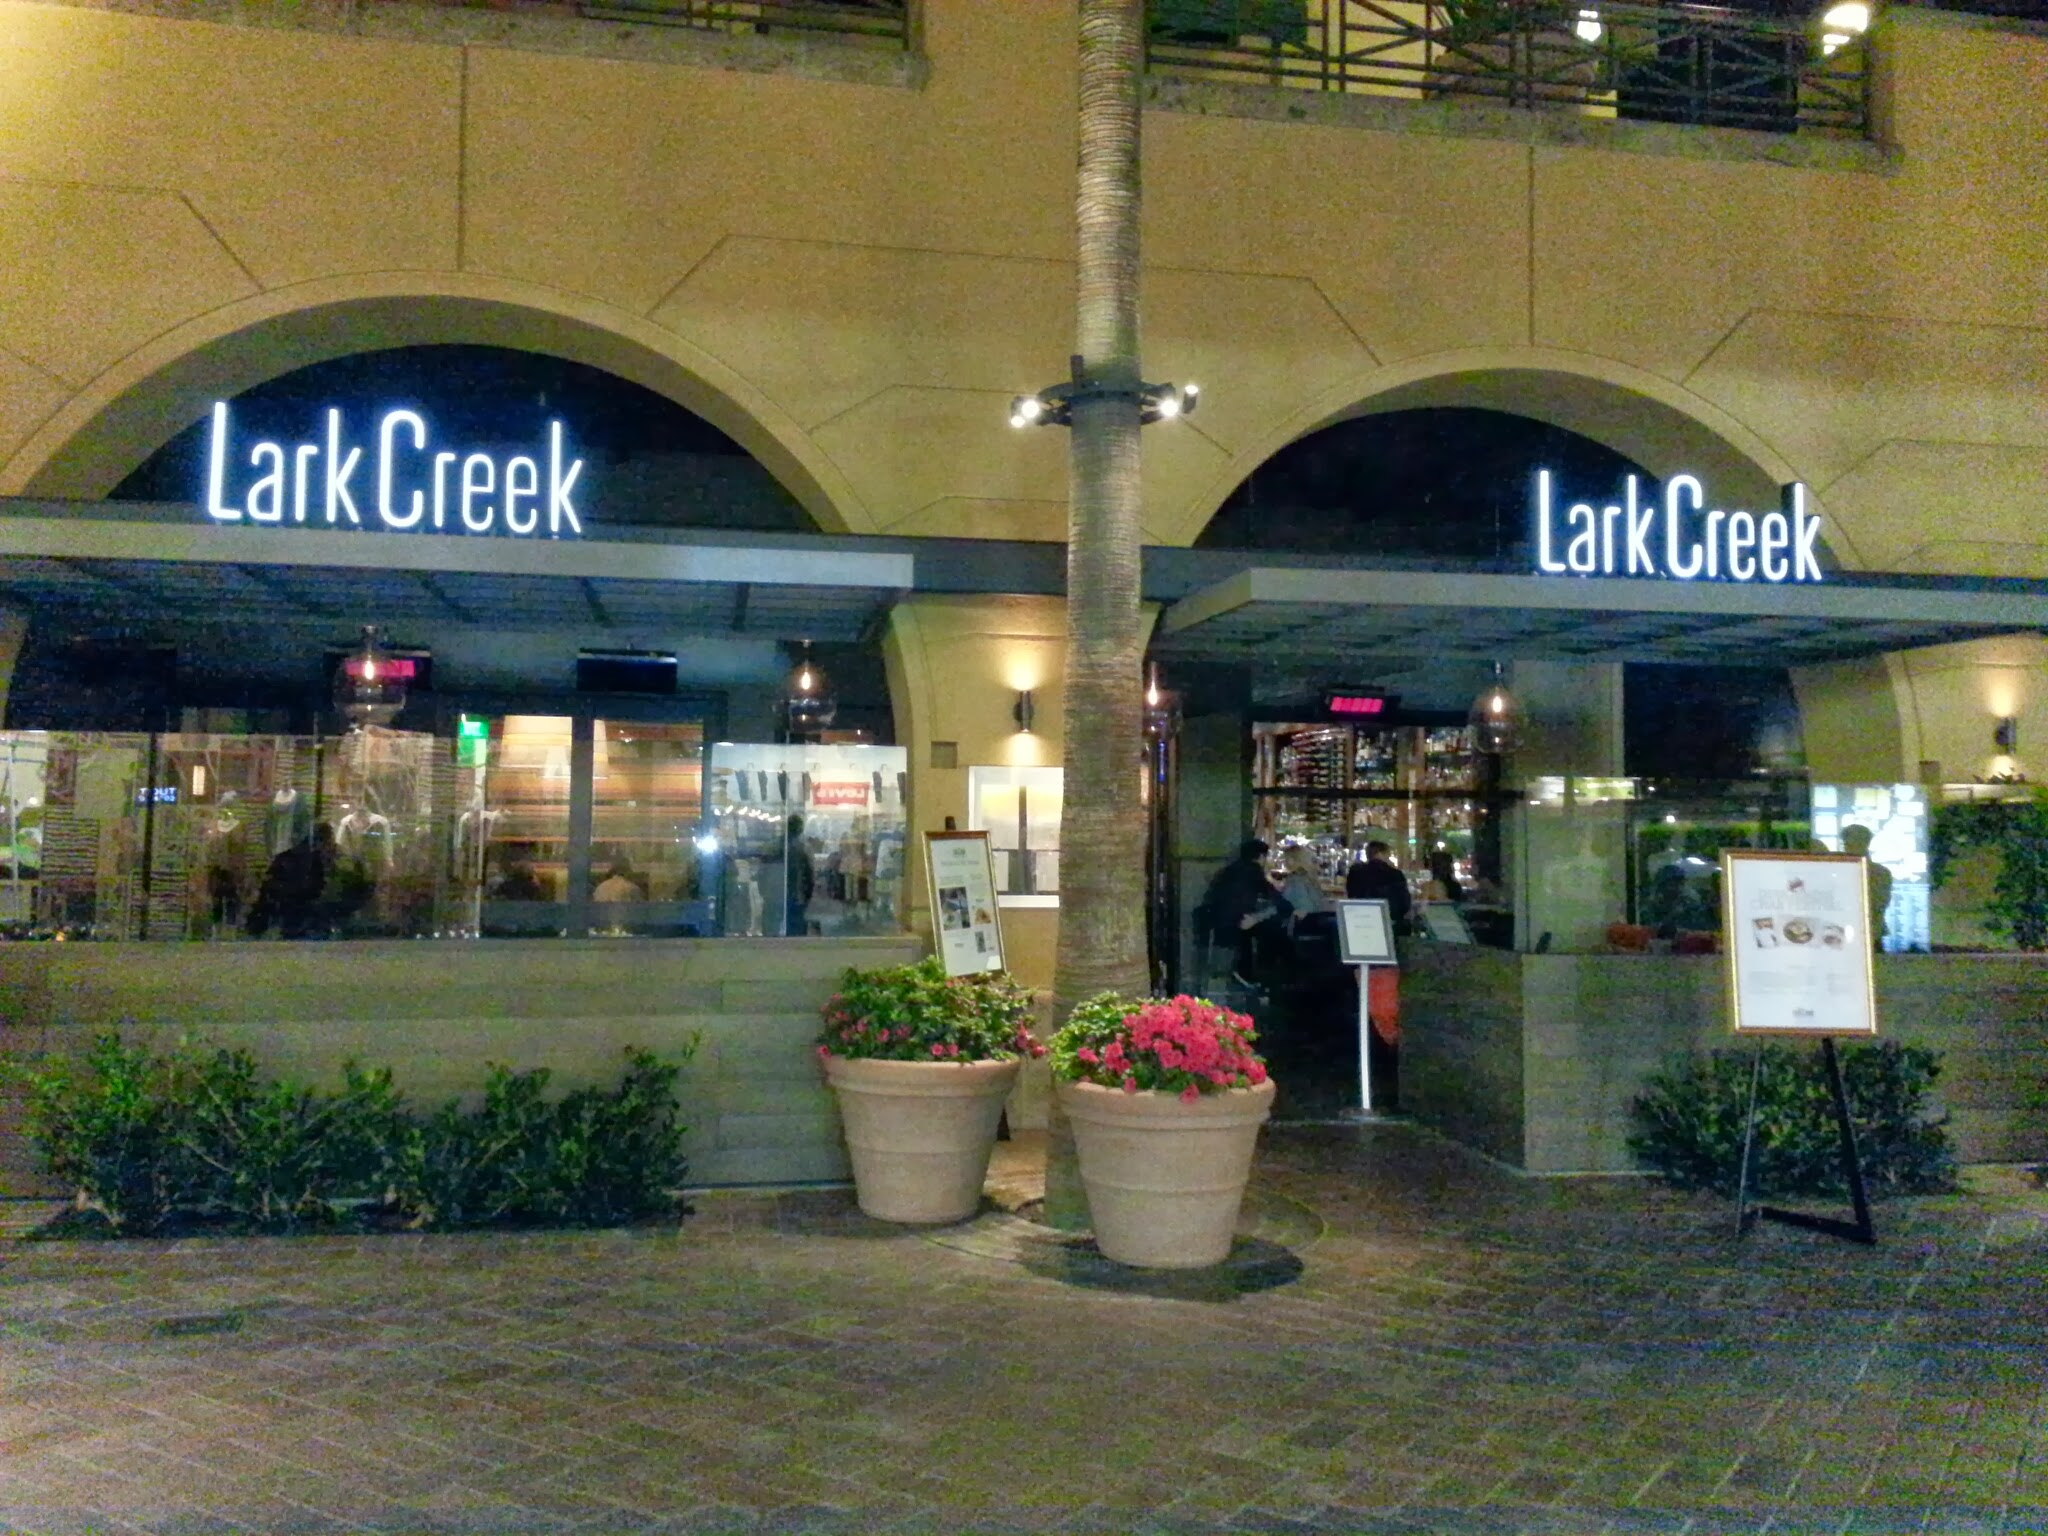 Fine dining restaurant exterior - Lark Creek Fine Dining Newport Beach Dungeness Crab Lark Creek Exterior